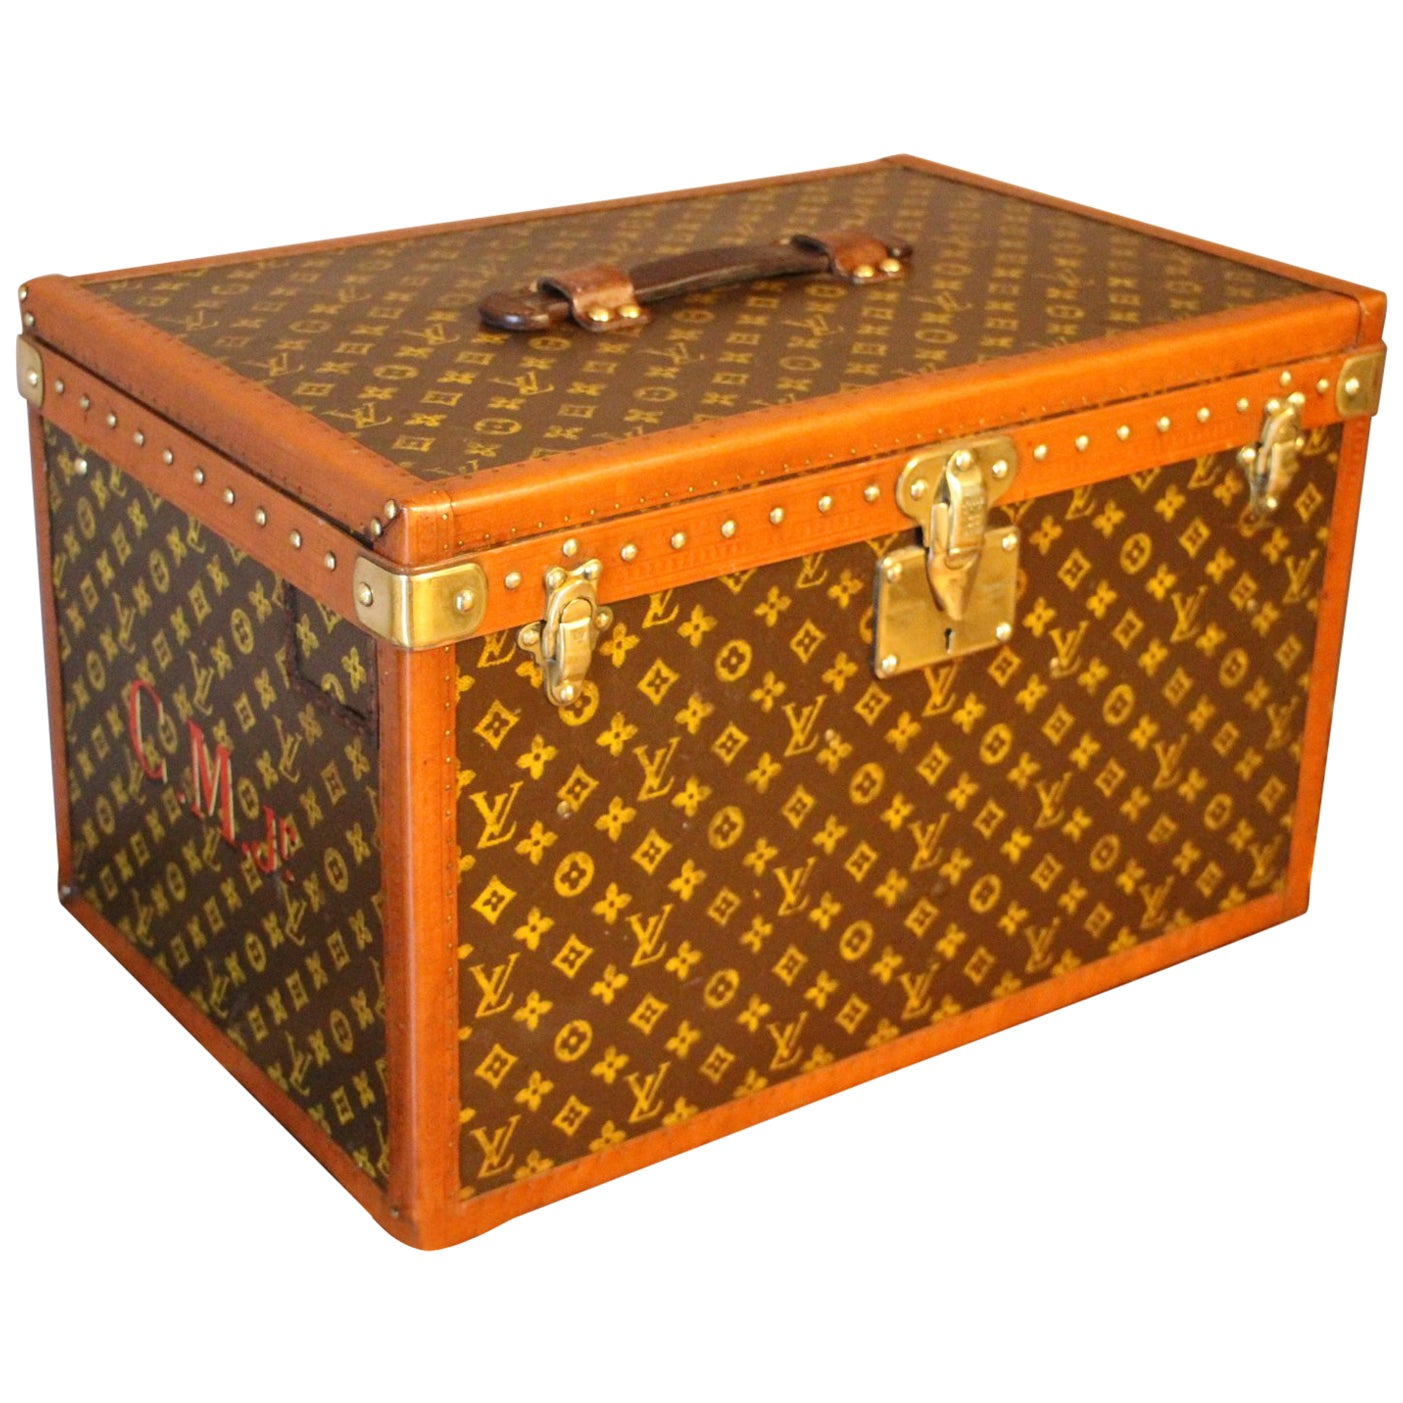 Louis Vuitton Trunk, Louis Vuitton Hat Trunk